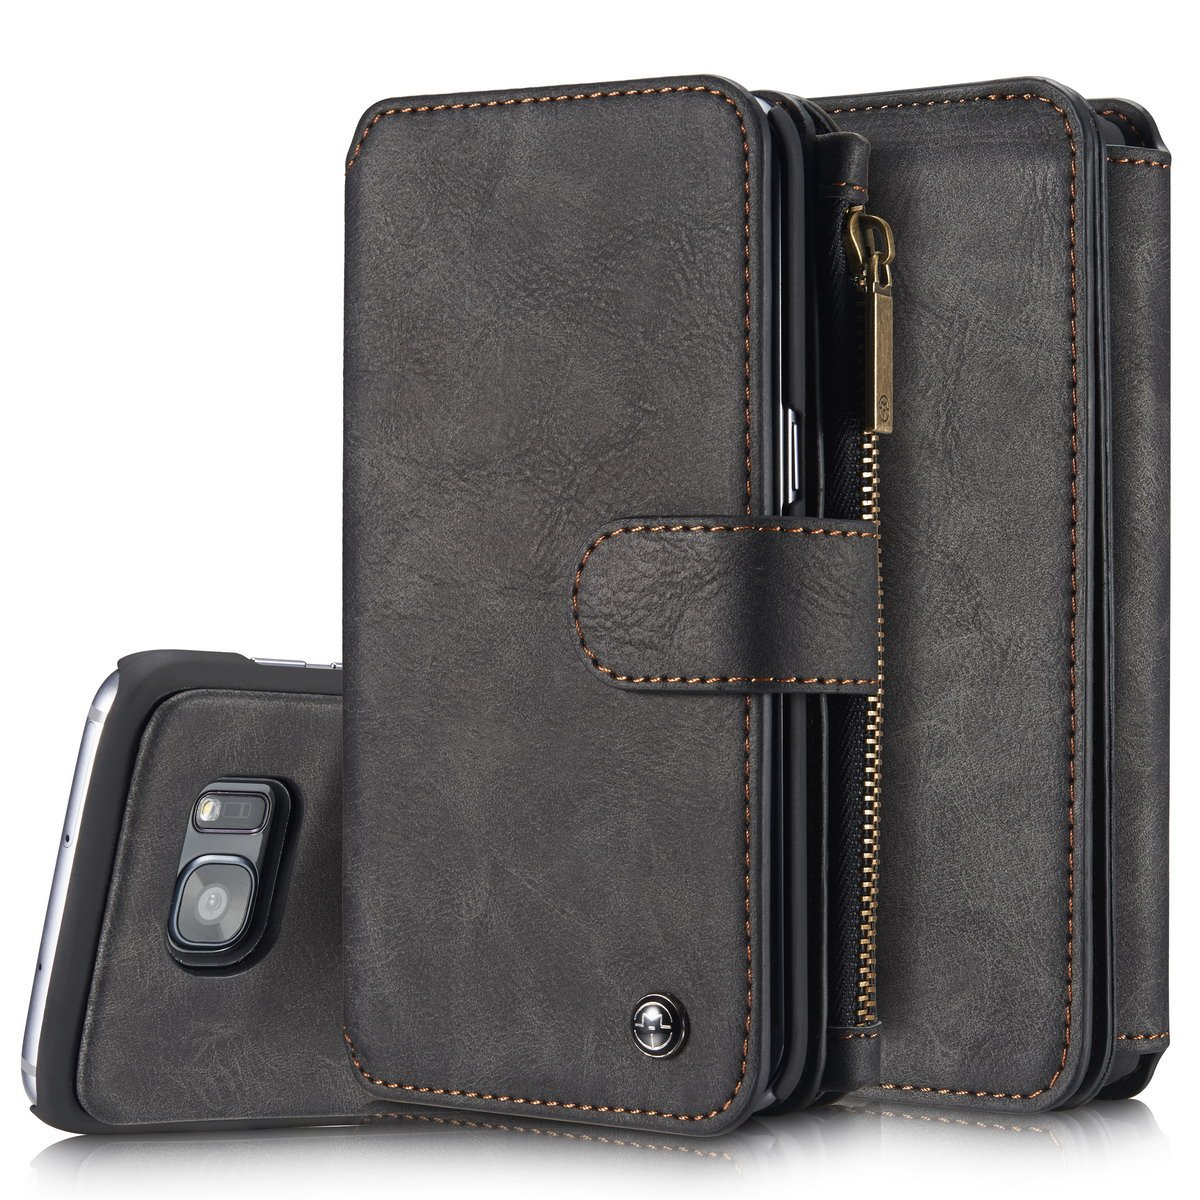 XRPow Galaxy S7 Edge Magnetic Detachable Wallet Case Premium Back Cover Slim Leather Folio Wallet Holder Case for Samsung Galaxy S7 Edge BLACK